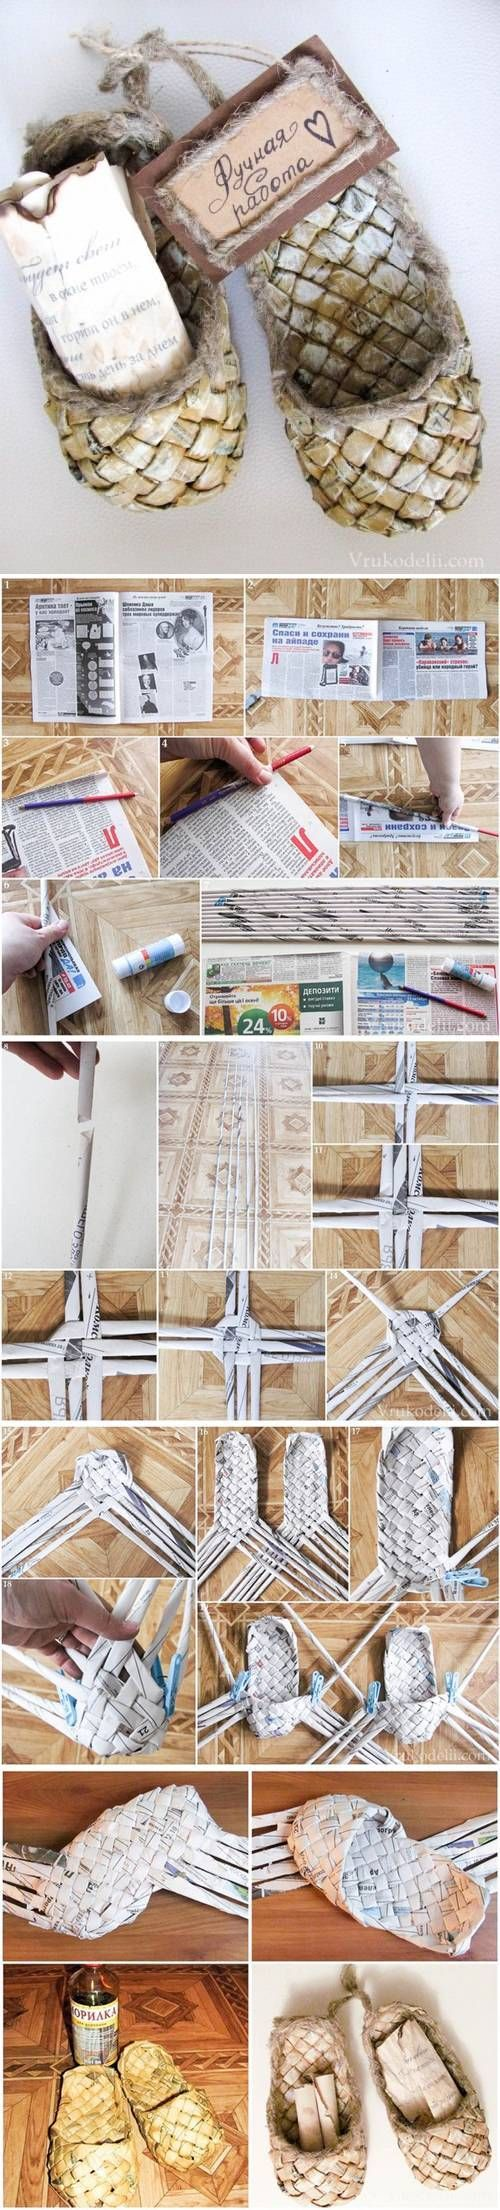 DIY Souvenir for Home DIY Souvenir for Home